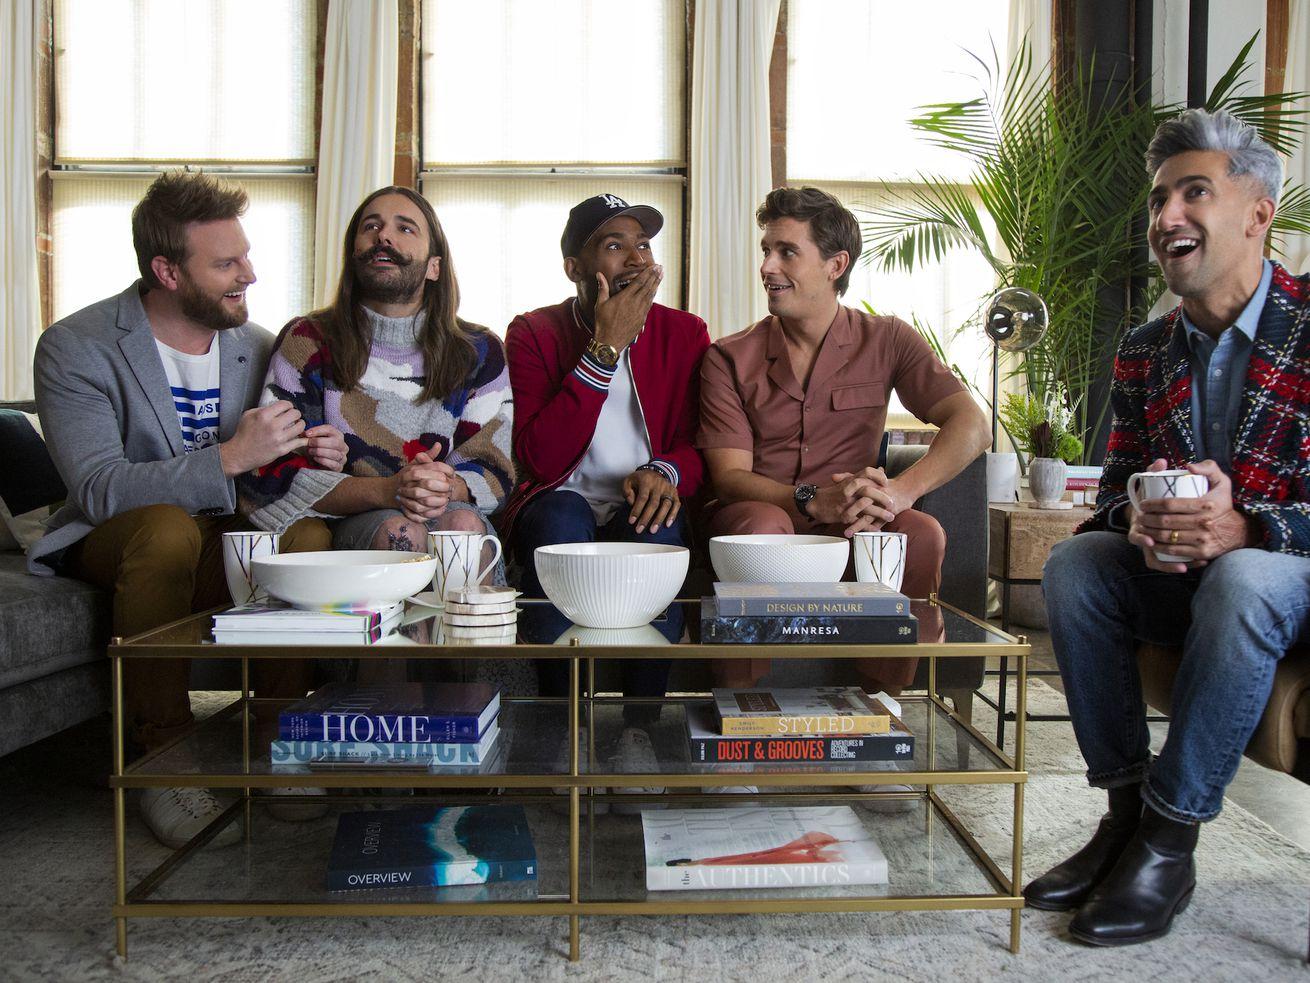 Bobby Berk, Jonathan Van Ness, Karamo Brown, Antoni Porowski, and Tan France sit on a modern sofa laughing